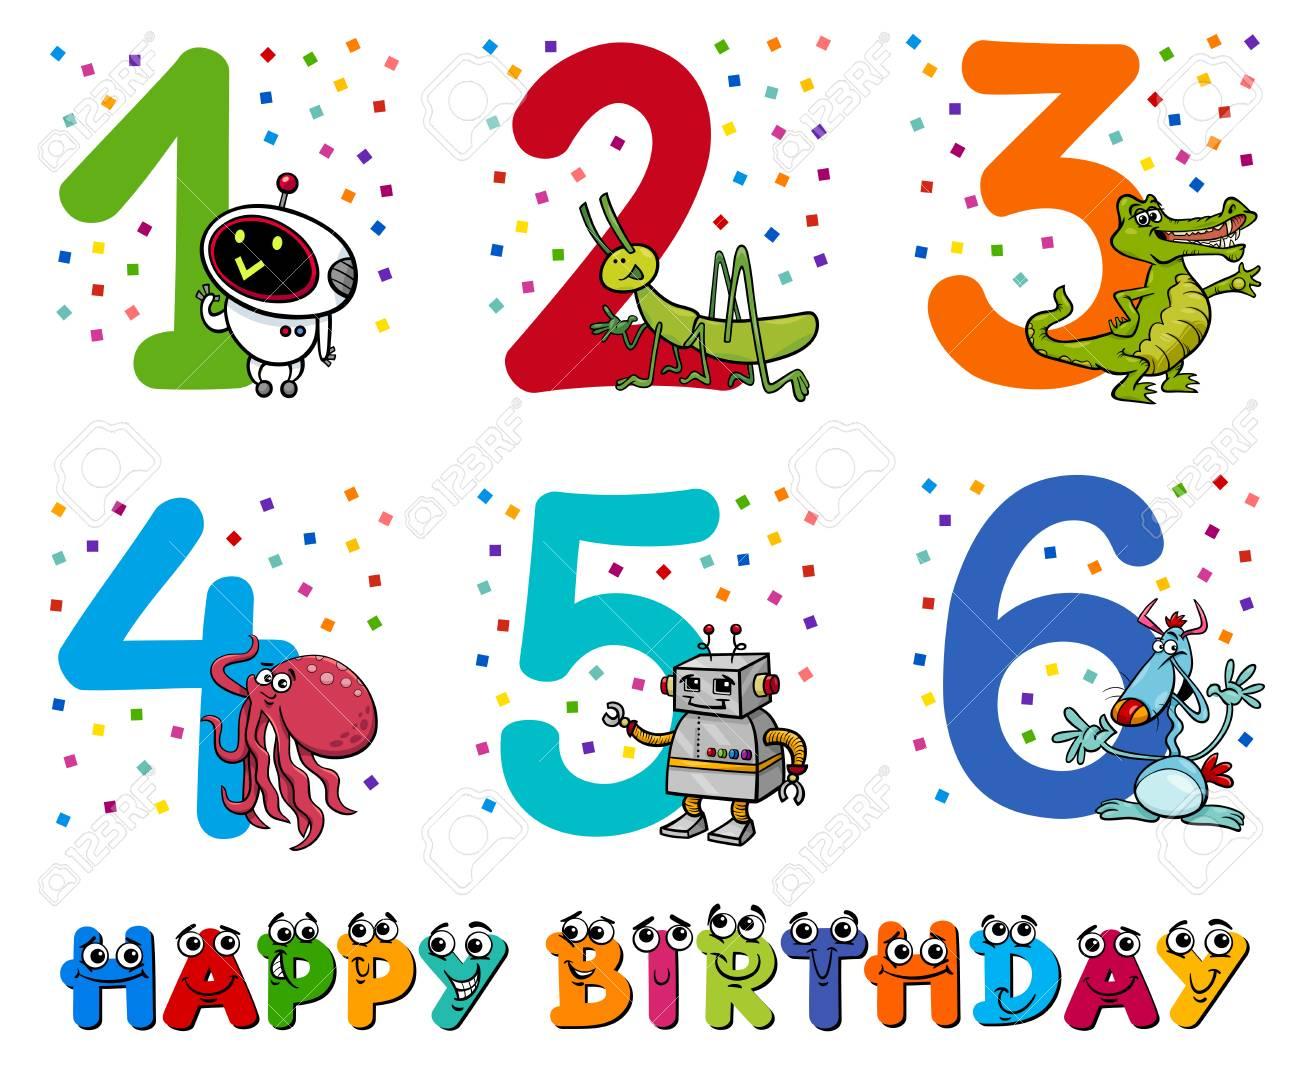 Cartoon Illustration Design Of The Birthday Greeting Cards Set